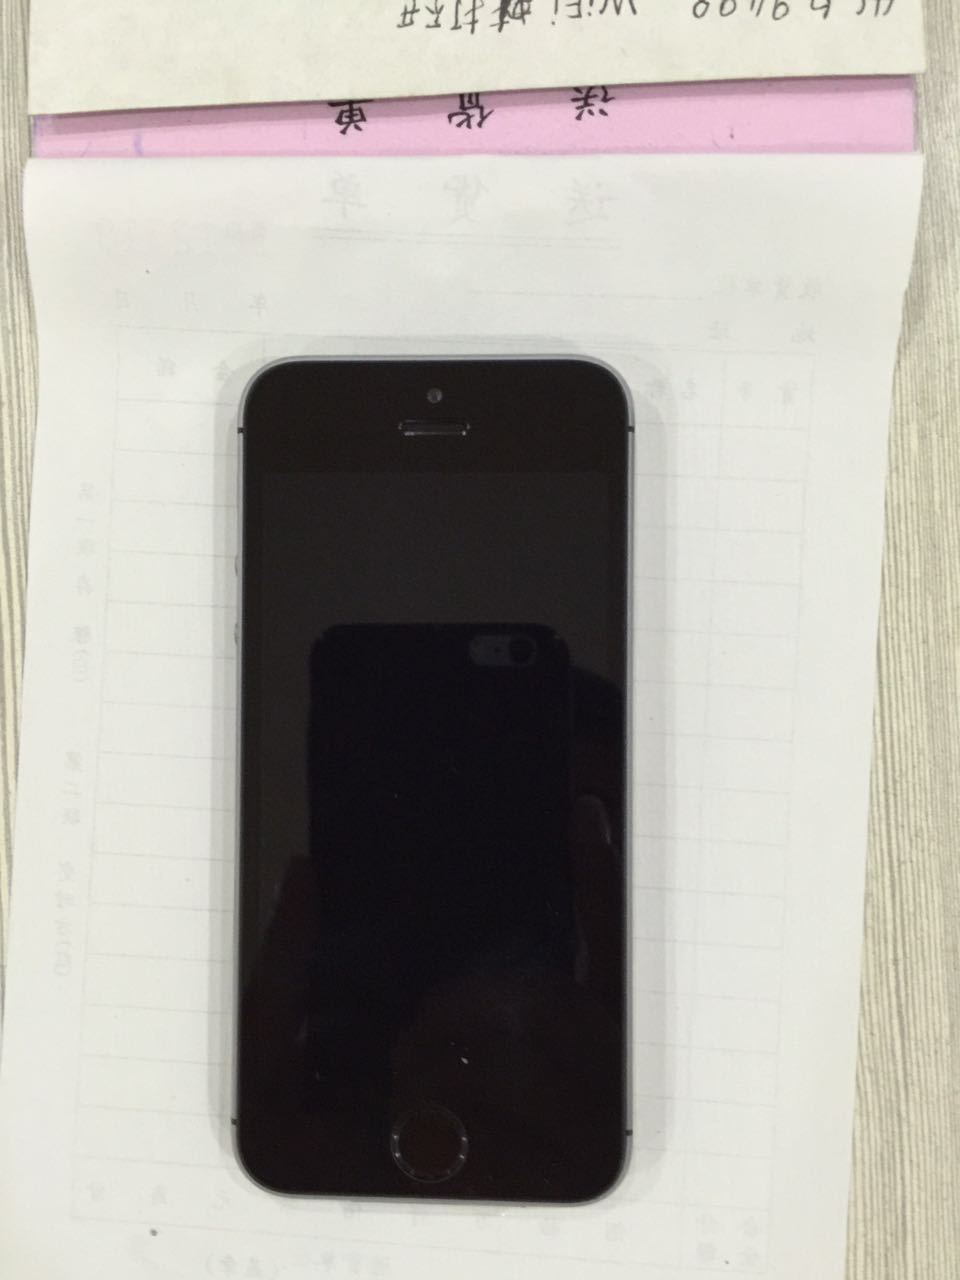 original factory refurbished Iphone 5 32gb